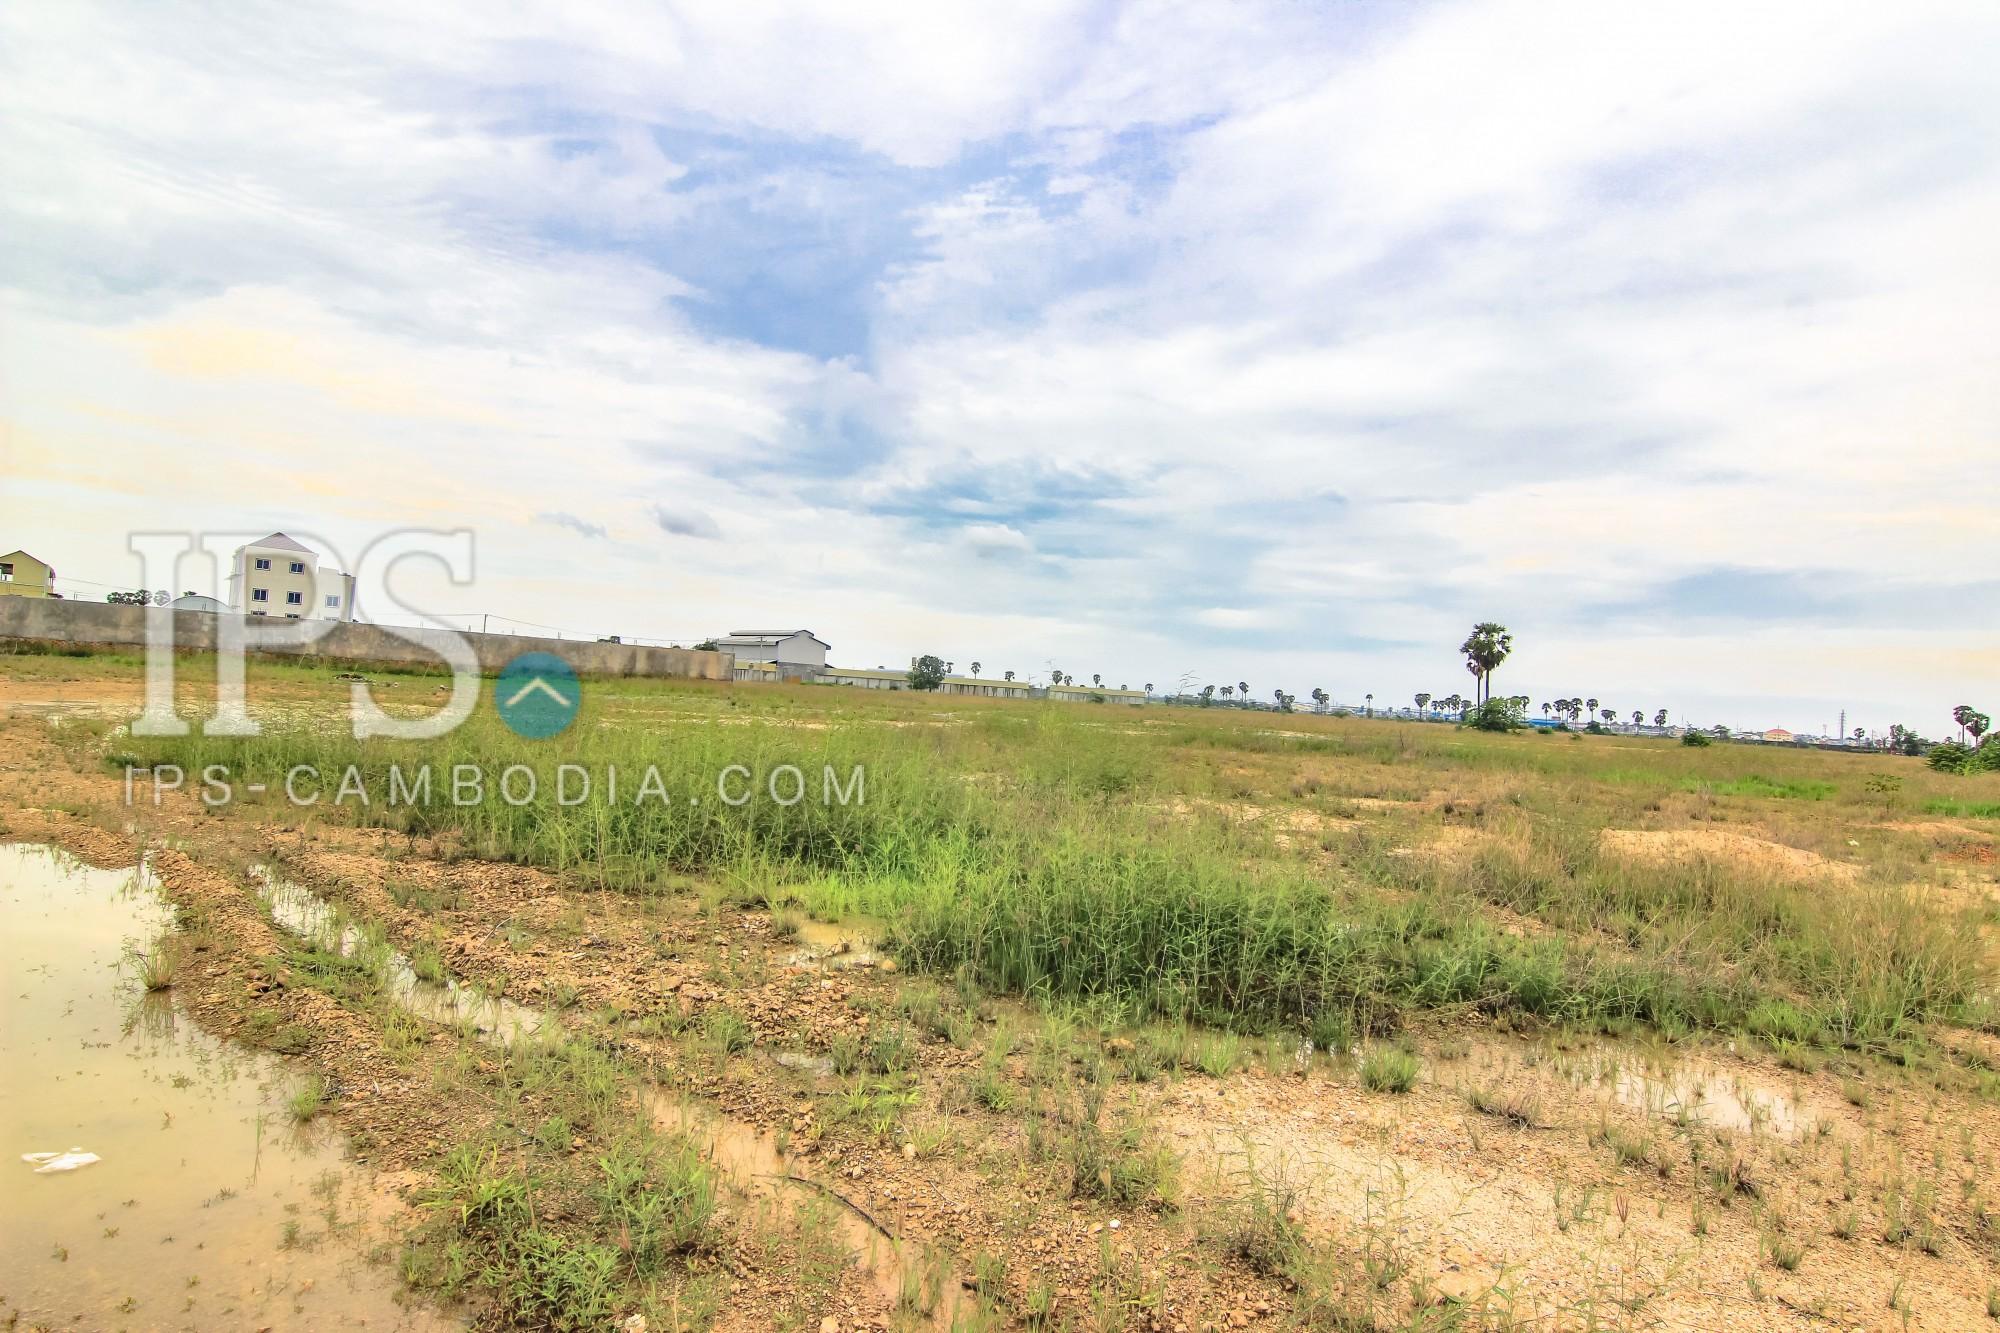 63,340 Sqm Commercial Land for Sale - Prey Sa road, Phnom Penh